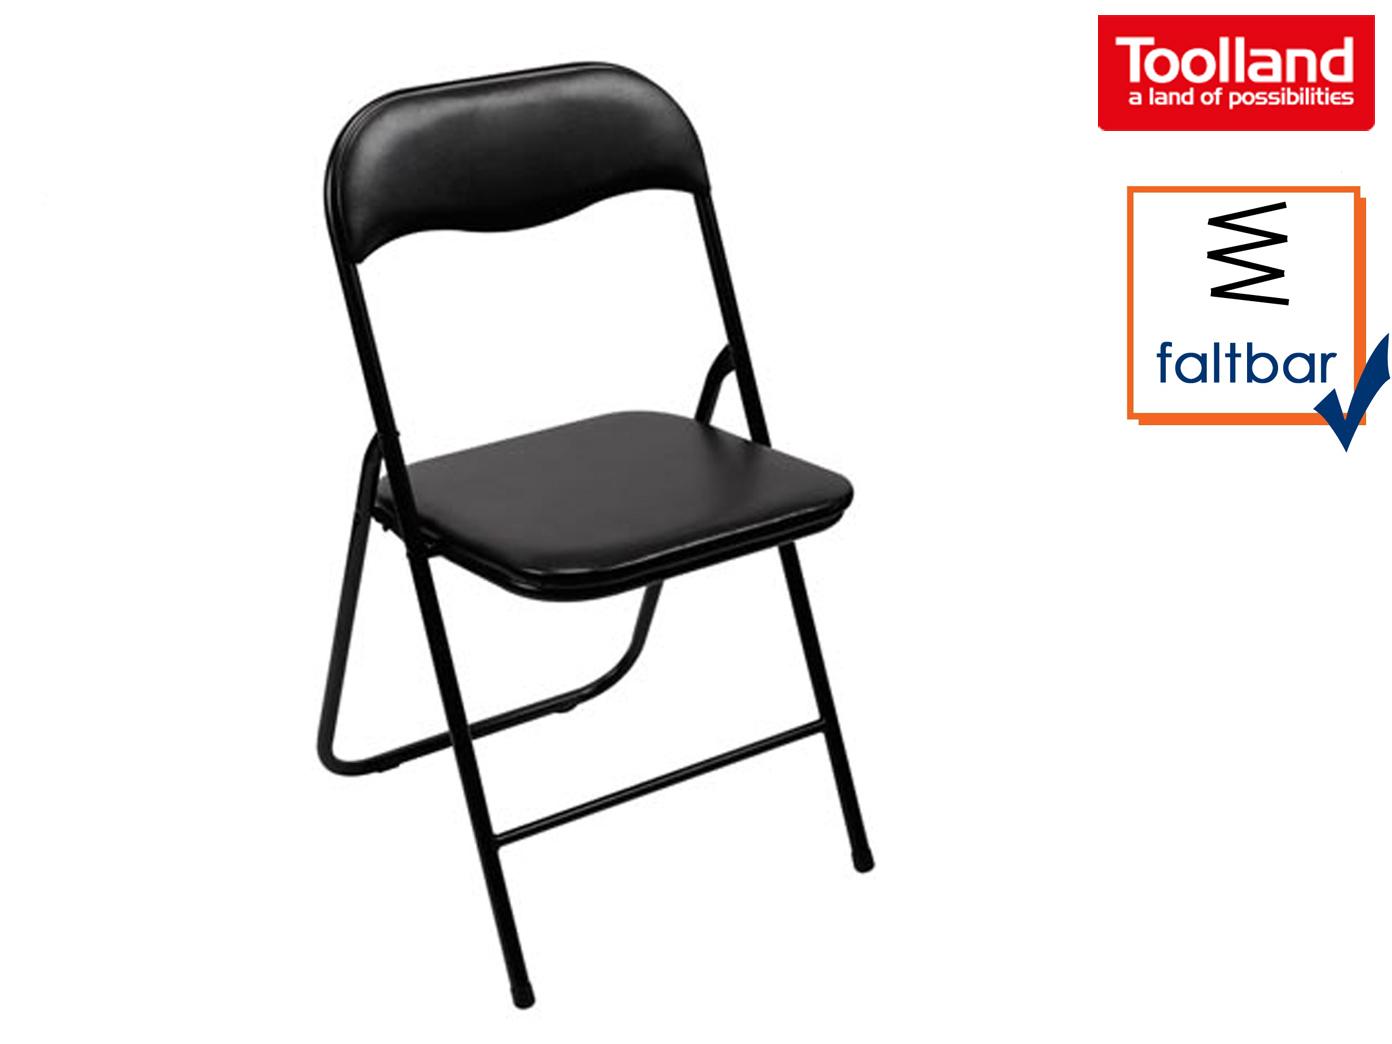 Klappstuhl Kaufen.Gepolsterter Klappstuhl Schwarz Faltbarer Stuhl Campingstuhl Terrassenmöbel